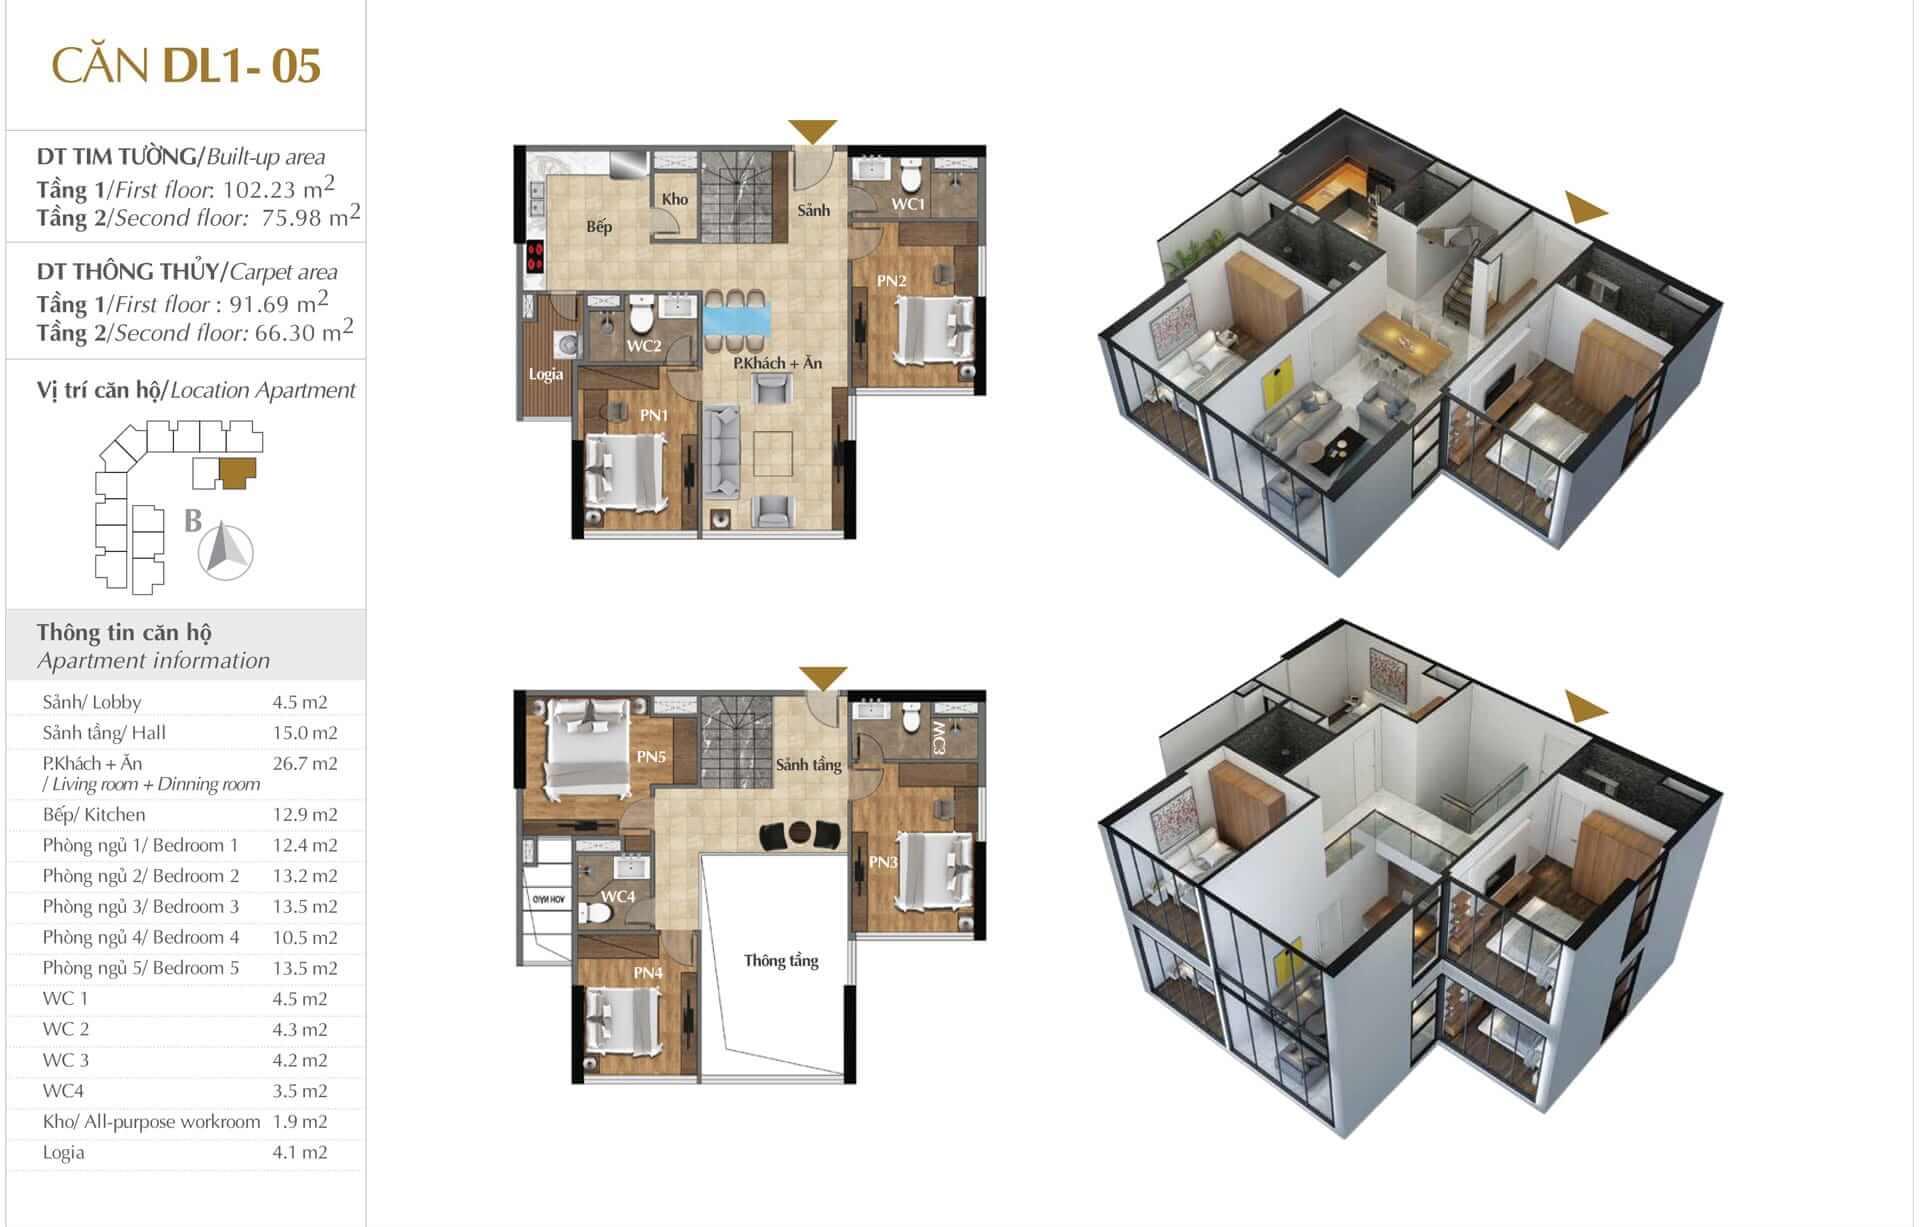 Thiết kế căn DL1 - 05